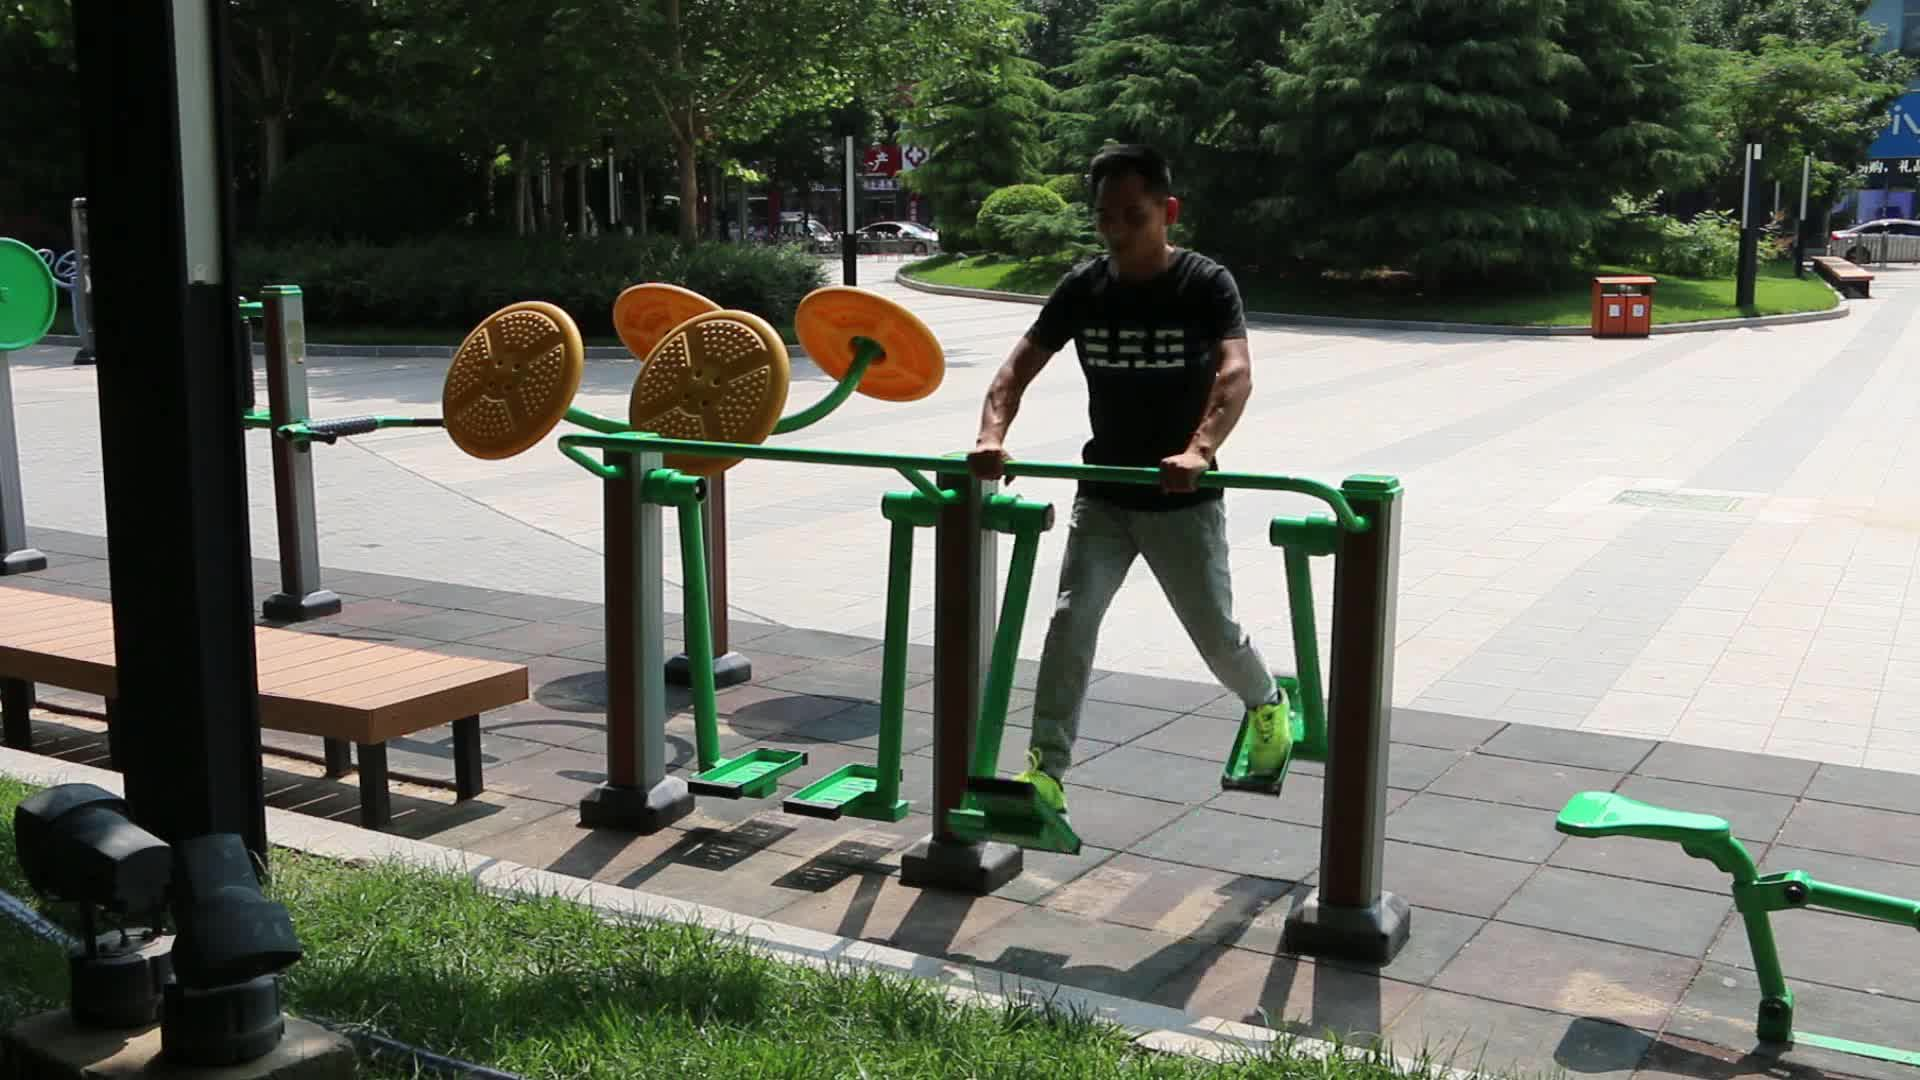 Curves fitness apparatuur voor koop Custom Oefening Apparatuur China Fabriek Street Workout Apparatuur Outdoor stepper